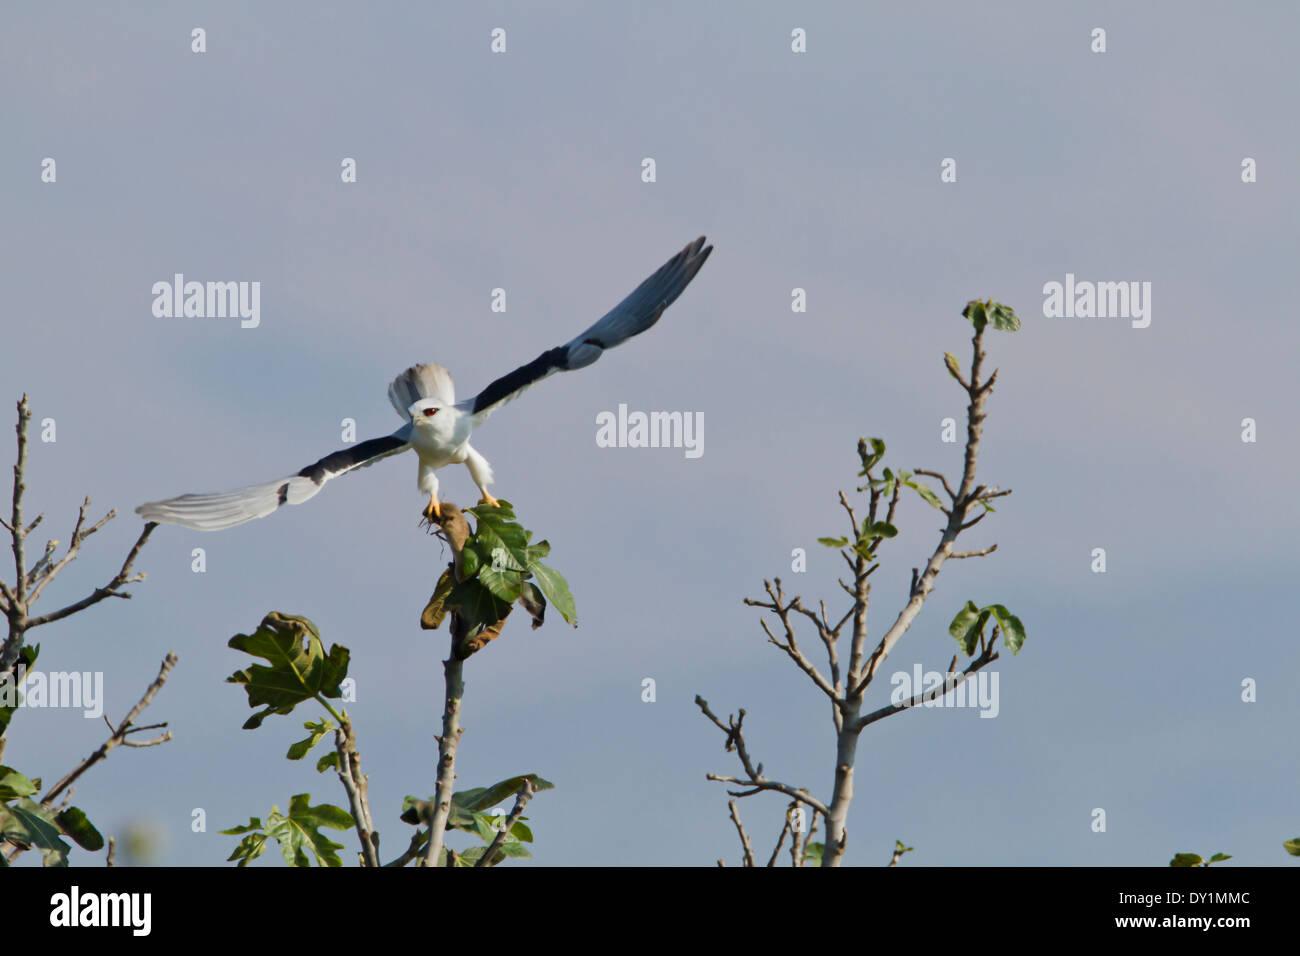 Gleitaar (Elanus Caeruleus) auf Baumkronen, Hulla-Tal, israel Stockbild